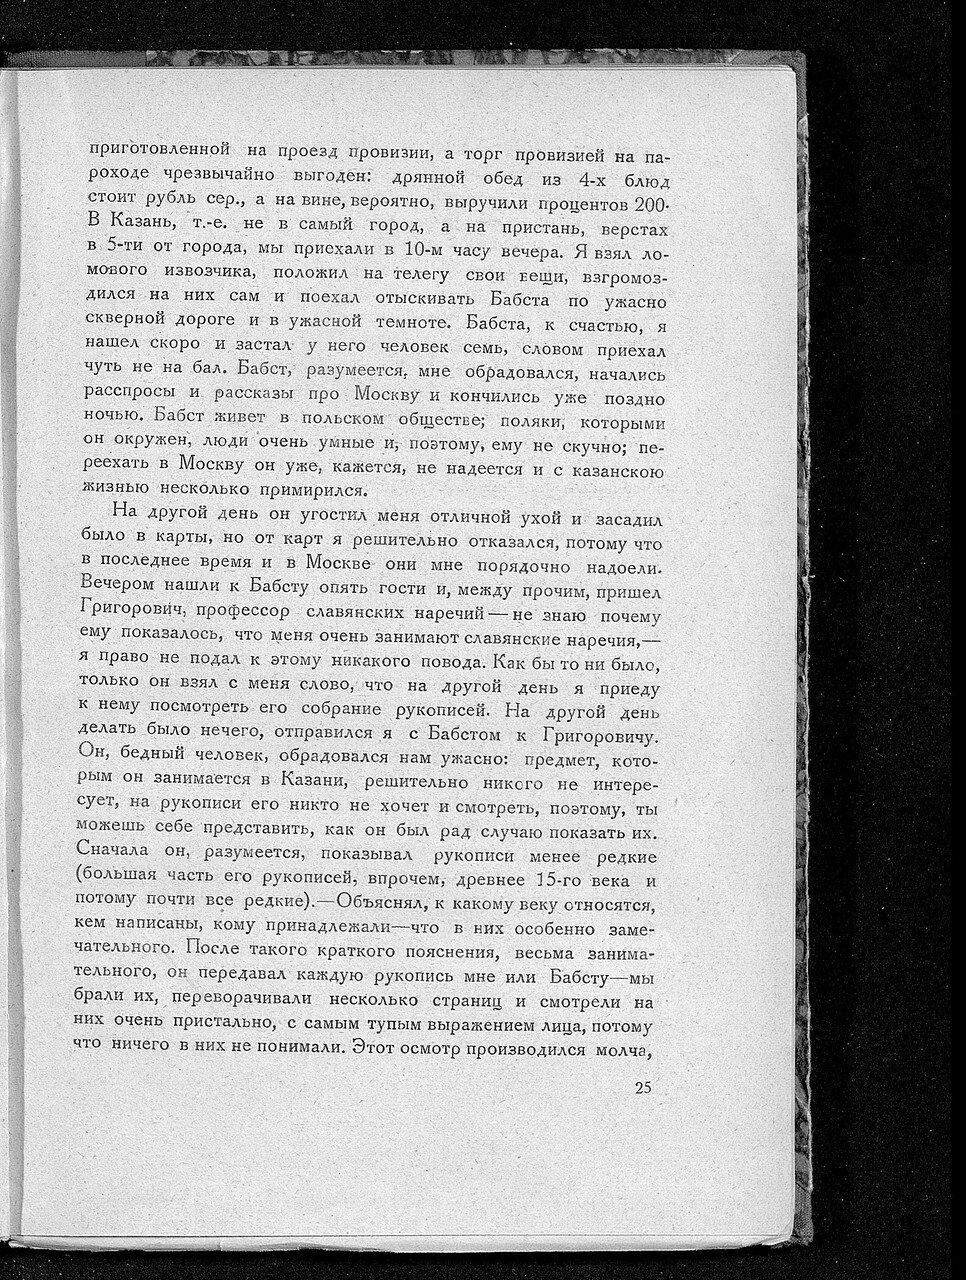 https://img-fotki.yandex.ru/get/484172/199368979.a0/0_214314_b0f7b659_XXXL.jpg